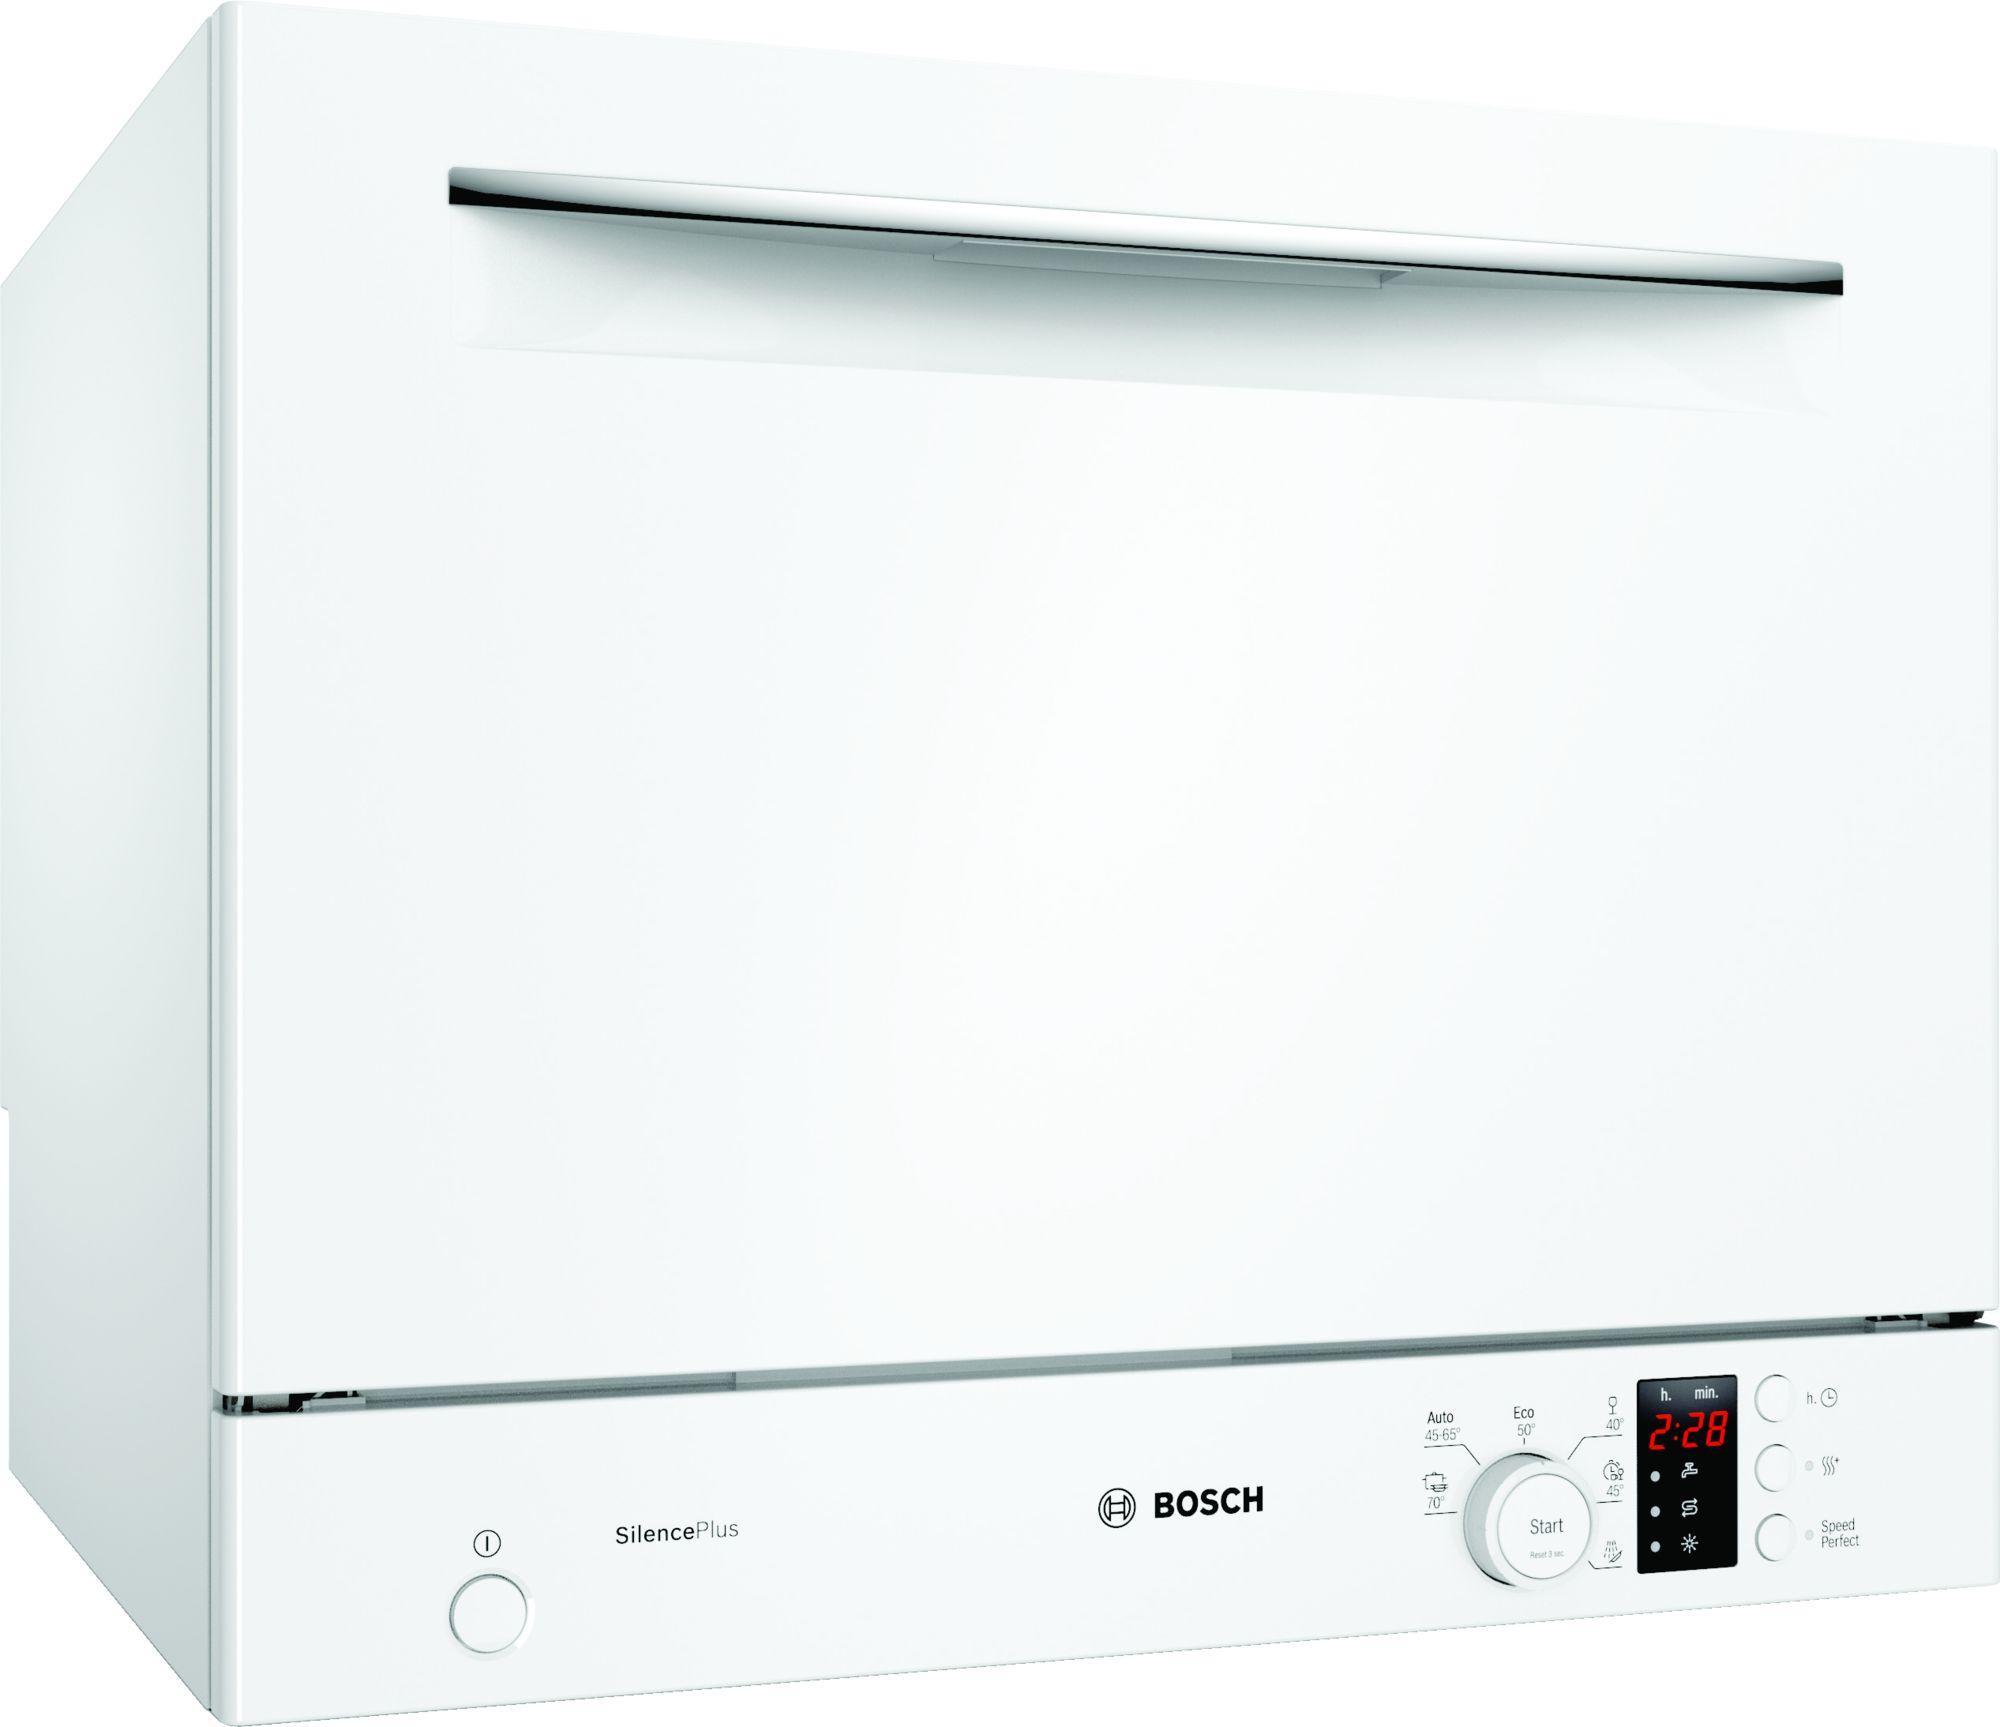 Image of Serie 4 SKS62E32EU 55cm Table Top Dishwasher